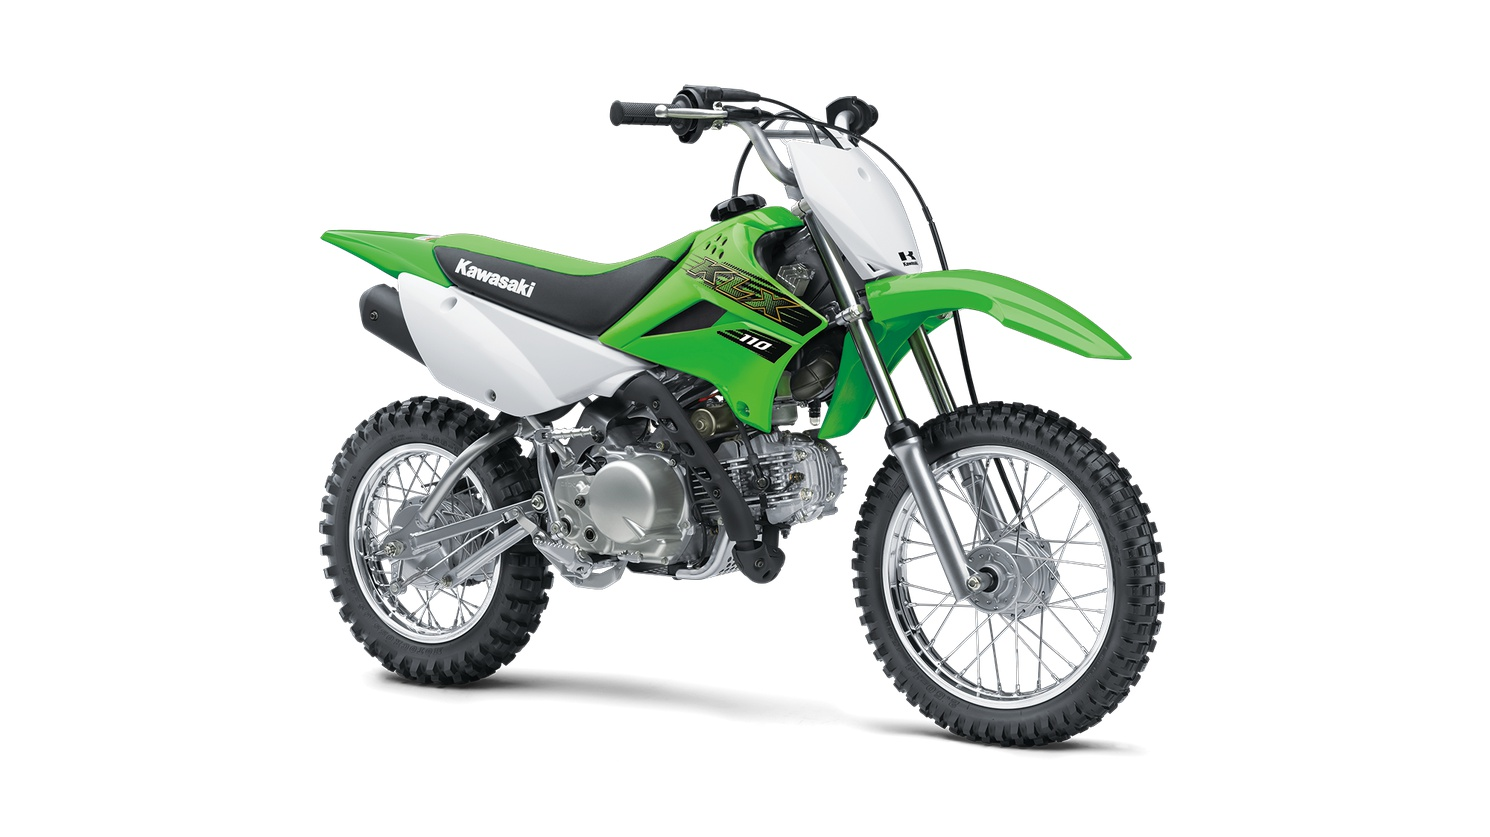 2020 Kawasaki KLX110 Lime Green